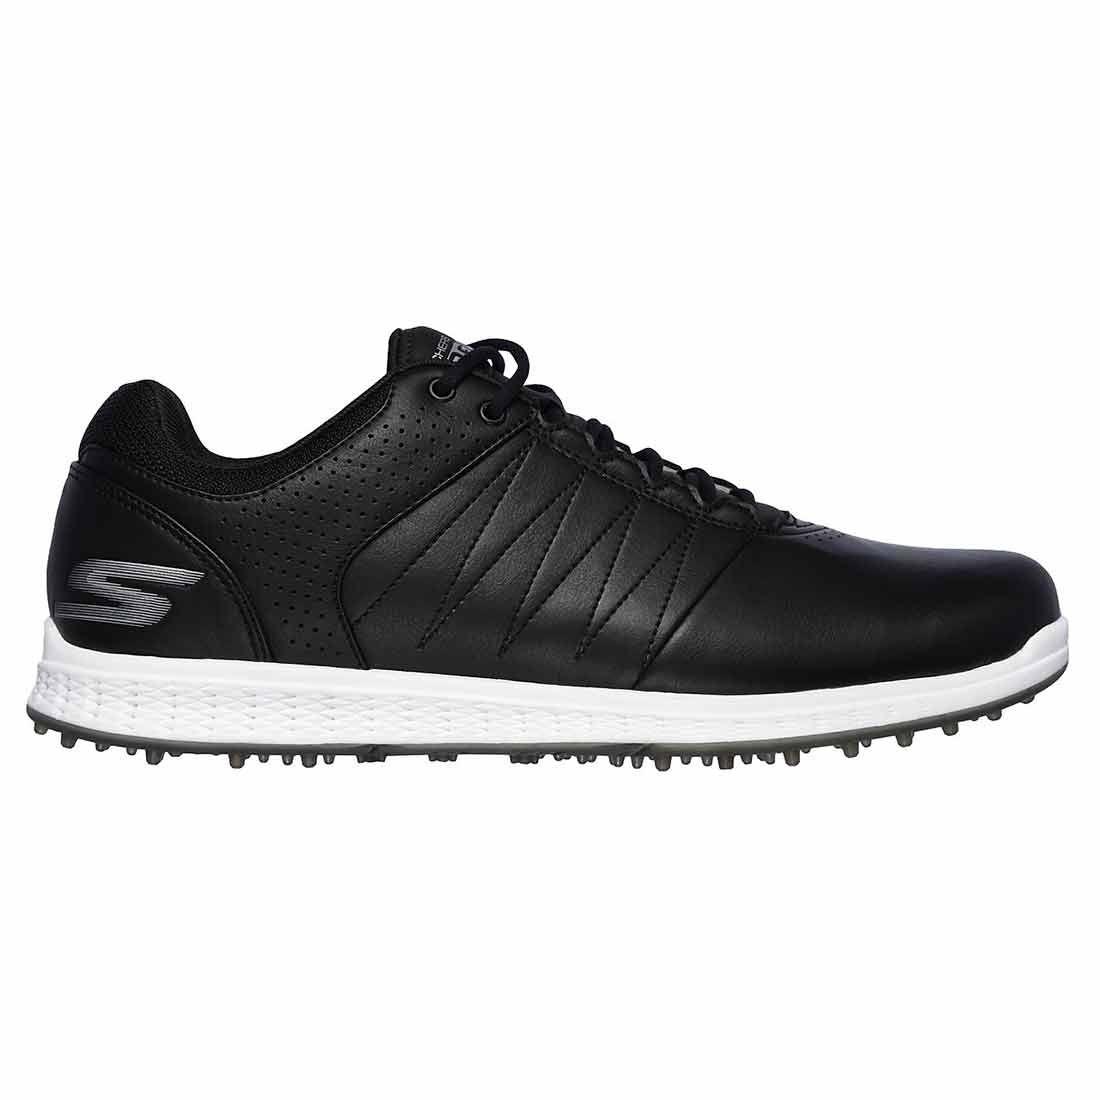 Buy Skechers GO GOLF Pivot Golf Shoes